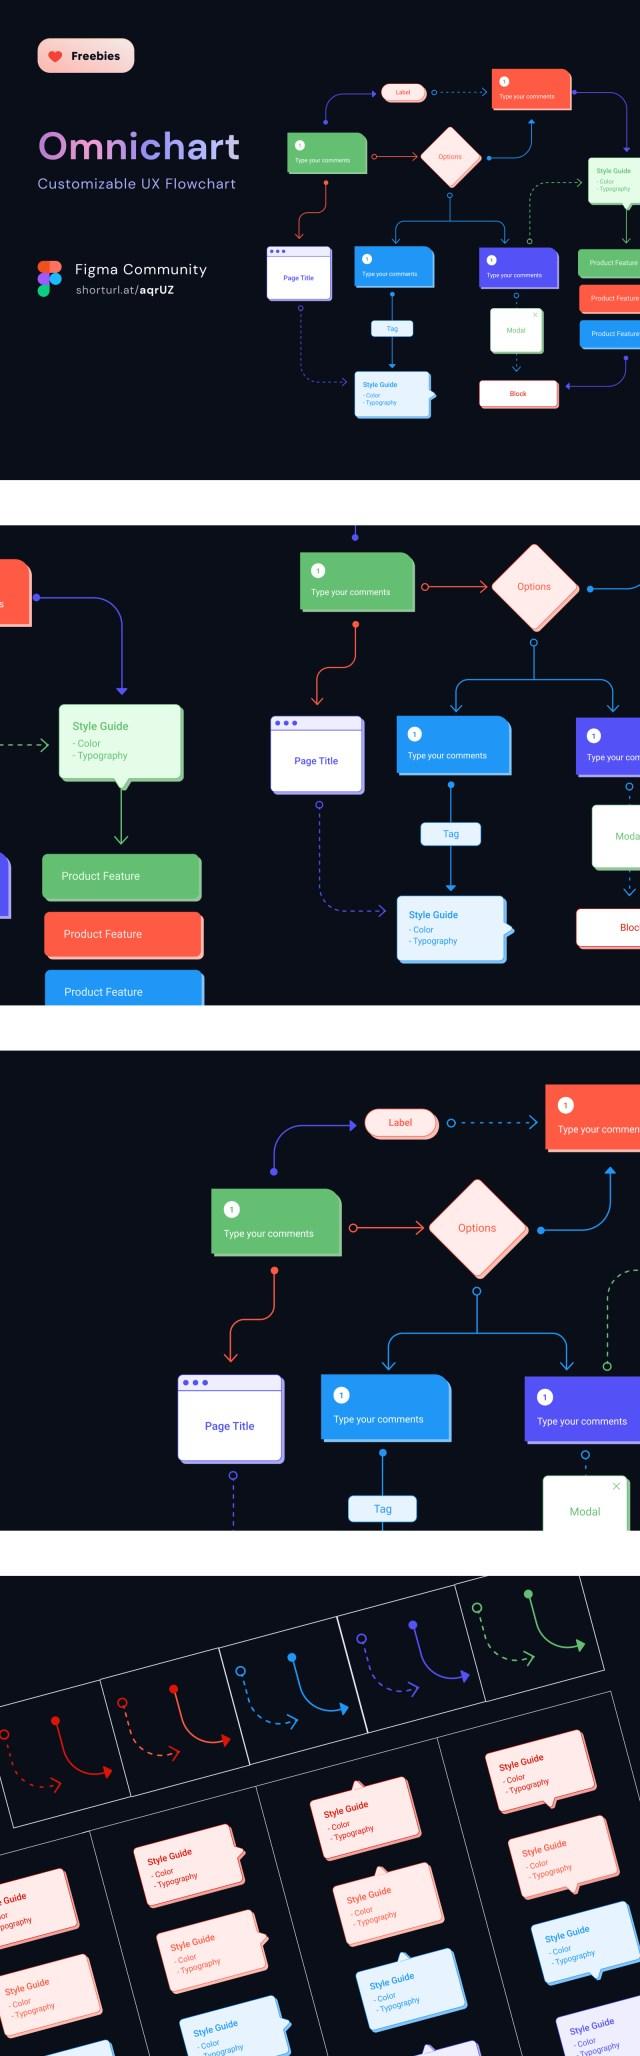 Omnichart - Free Customizable UX Flow Chart for Figma